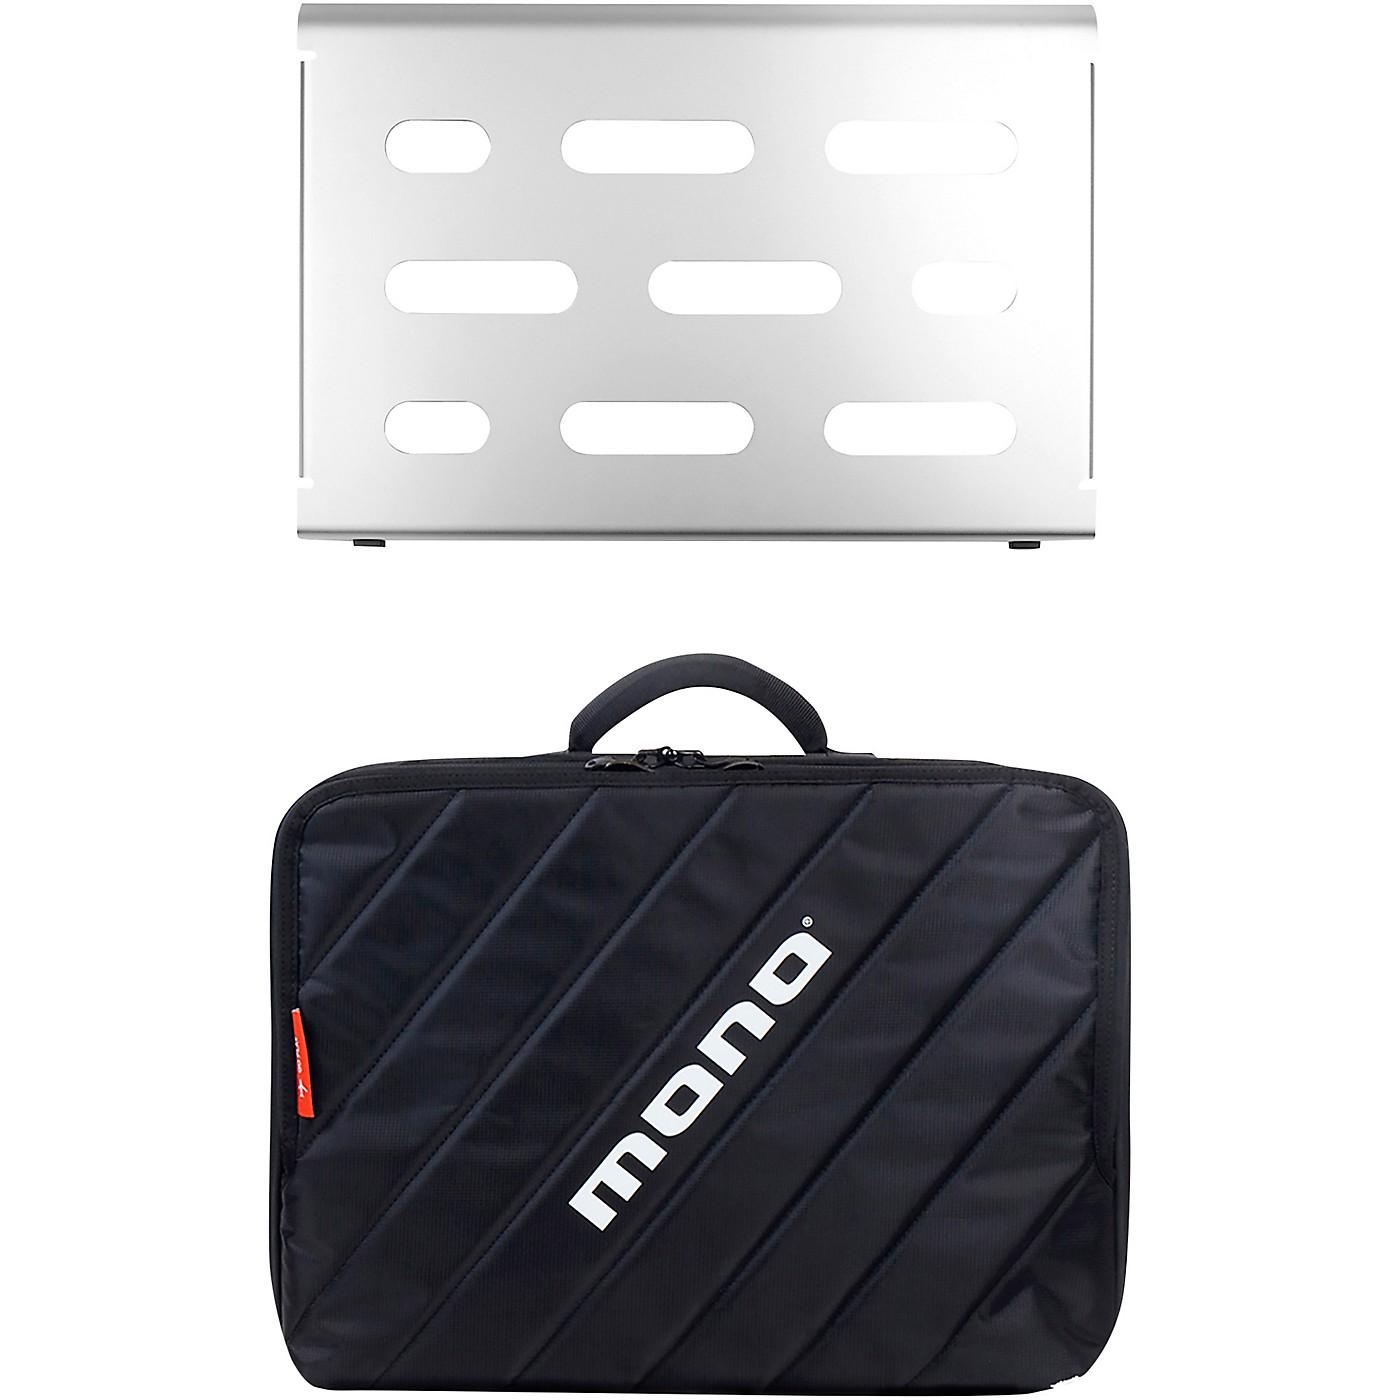 MONO Pedalboard Small, Silver and Club Accessory Case 2.0, Black thumbnail